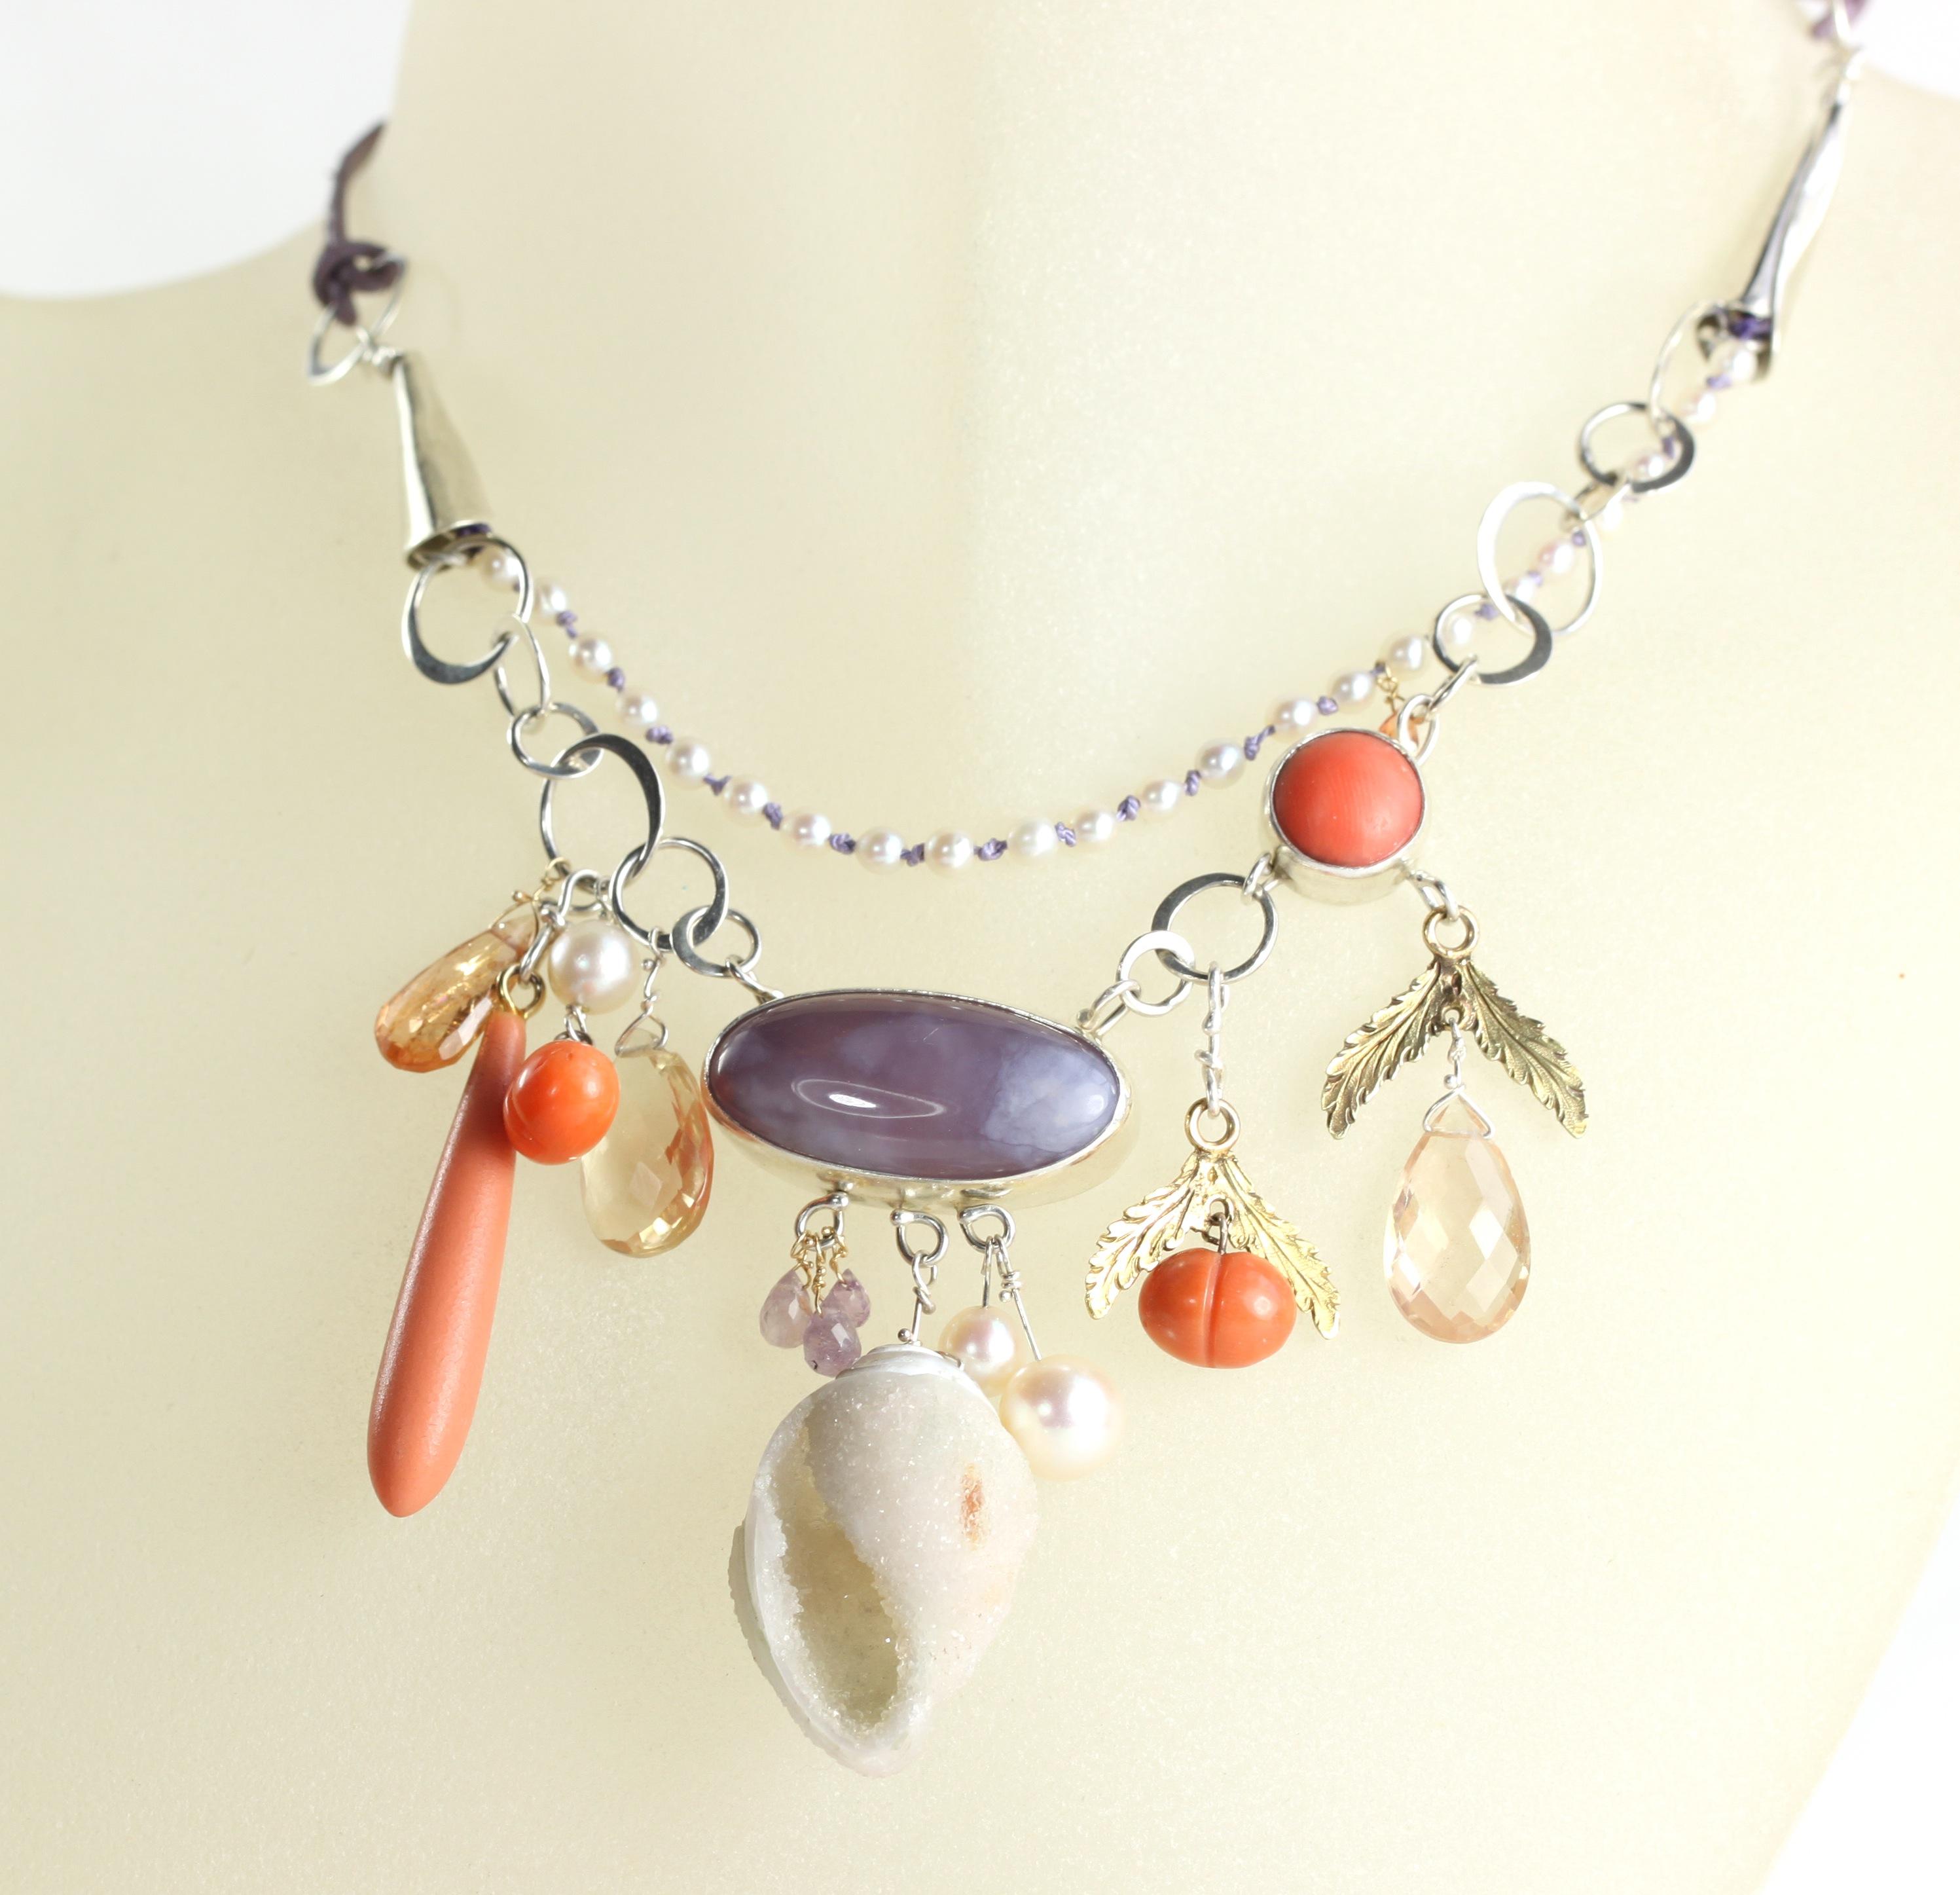 4Kate Coral Lavender Necklace